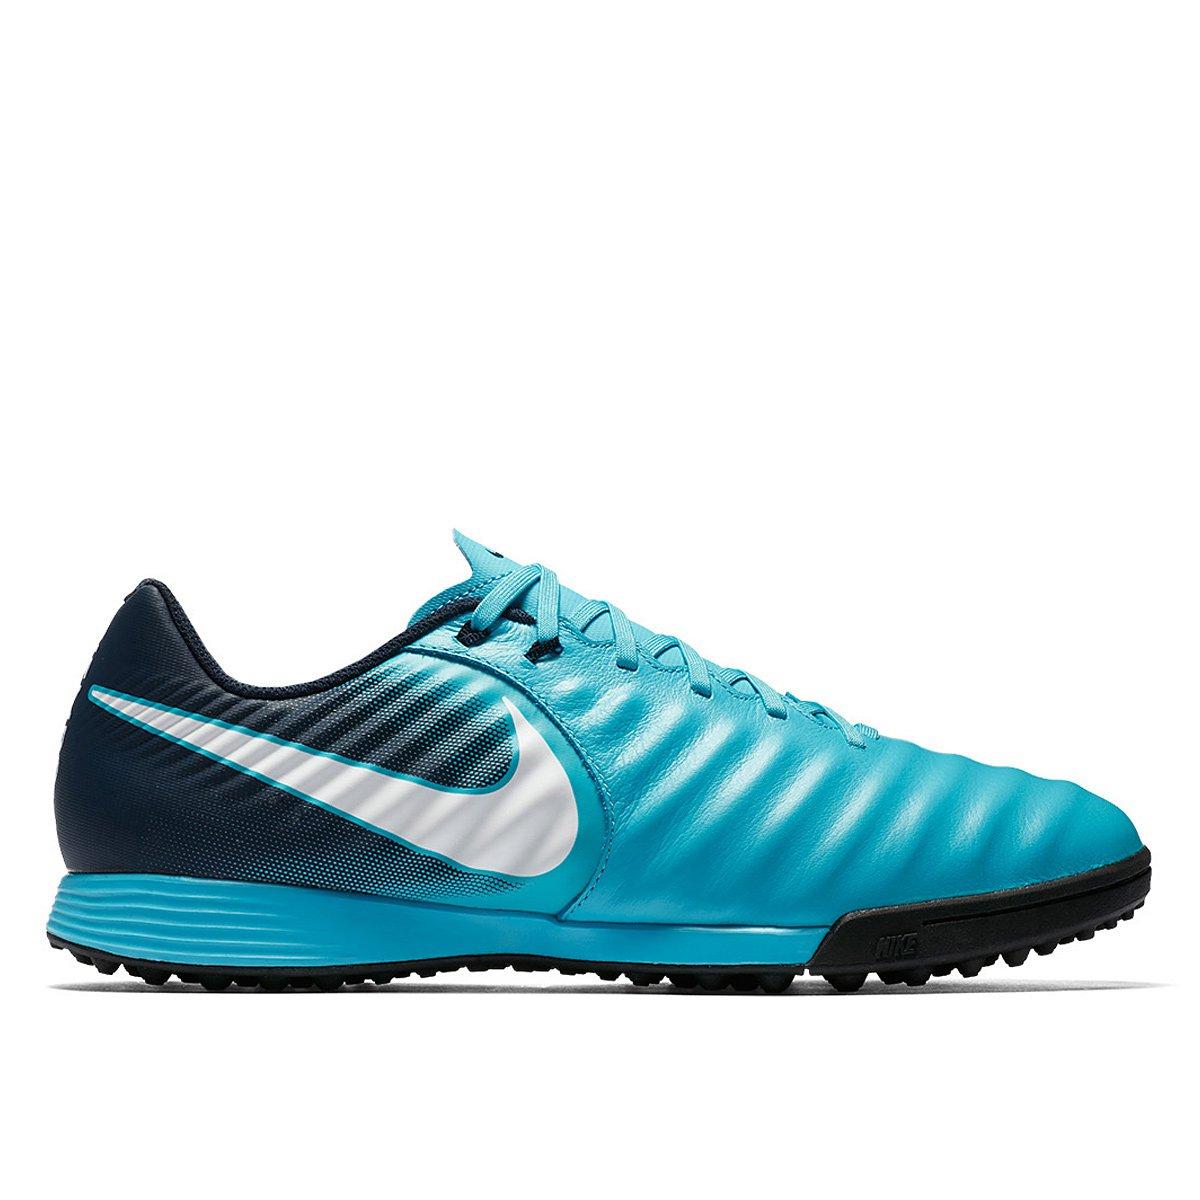 a3ee48eee5 Chuteira Society Nike Tiempo Ligera 4 TF - Azul e Branco